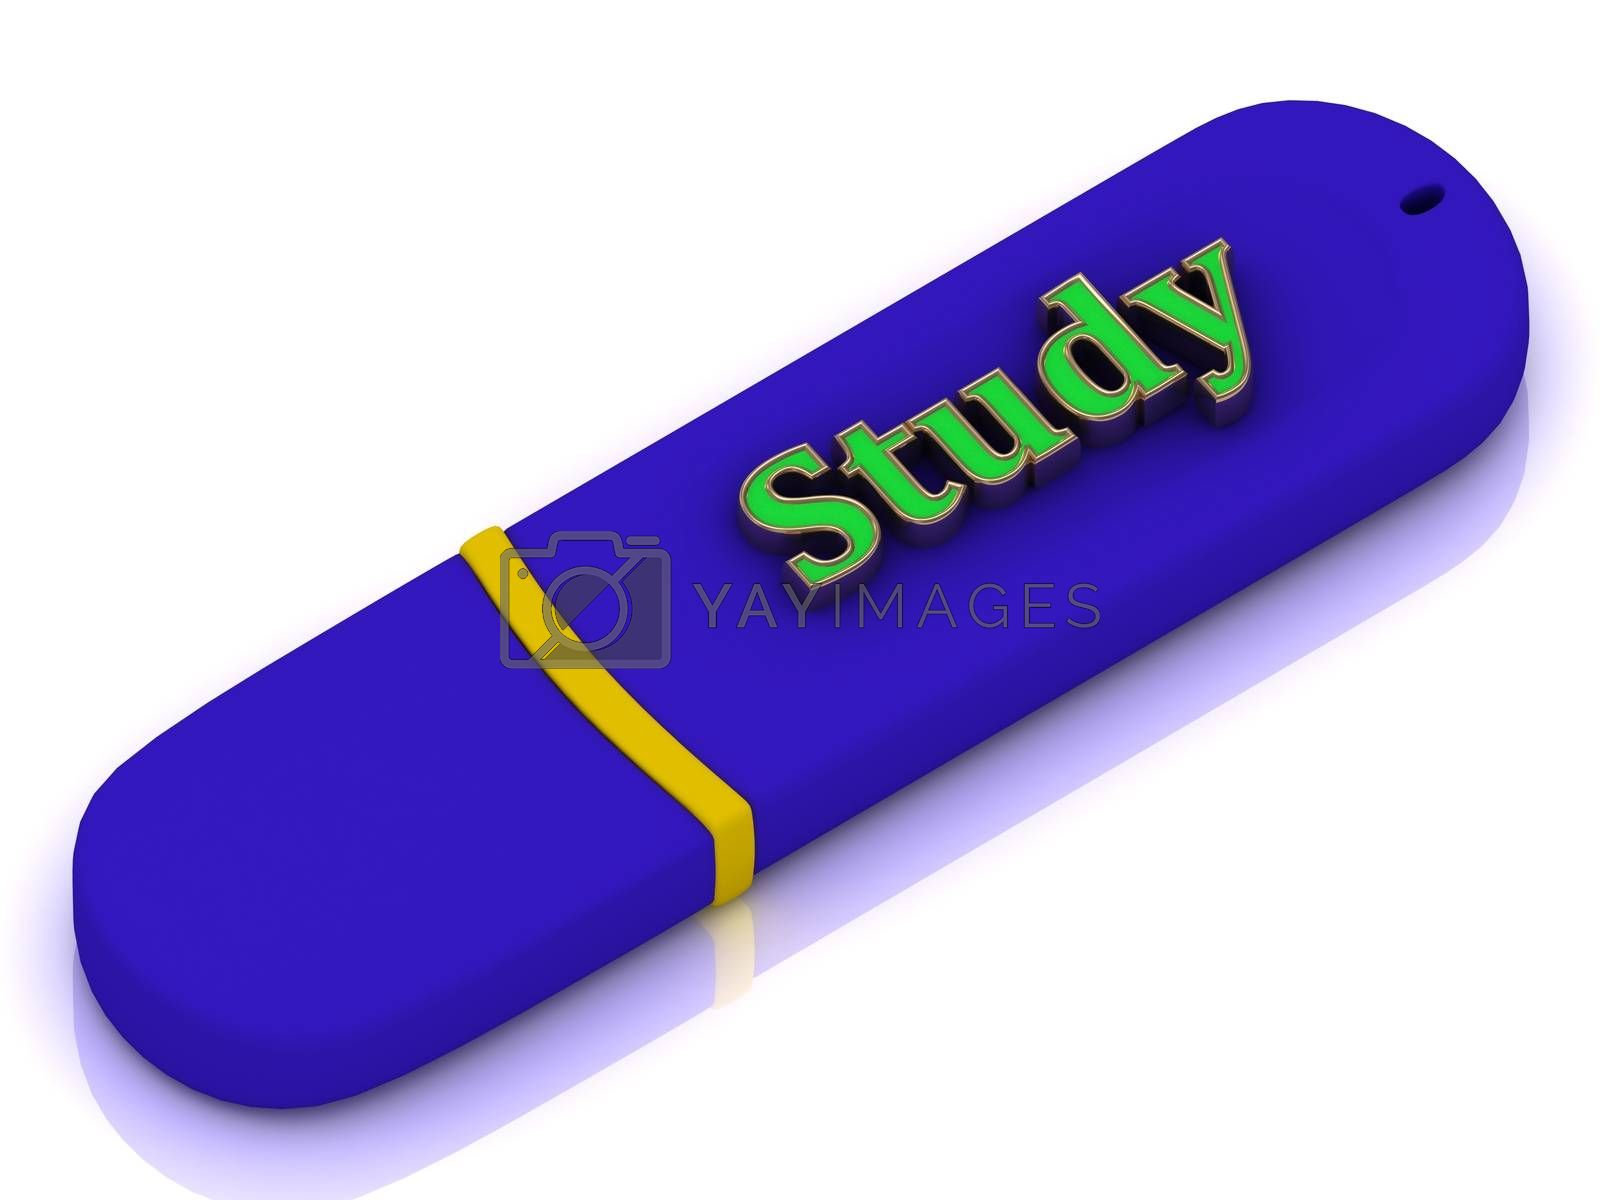 Study flash - inscription bright green volume letter on blue USB flash drive on white background